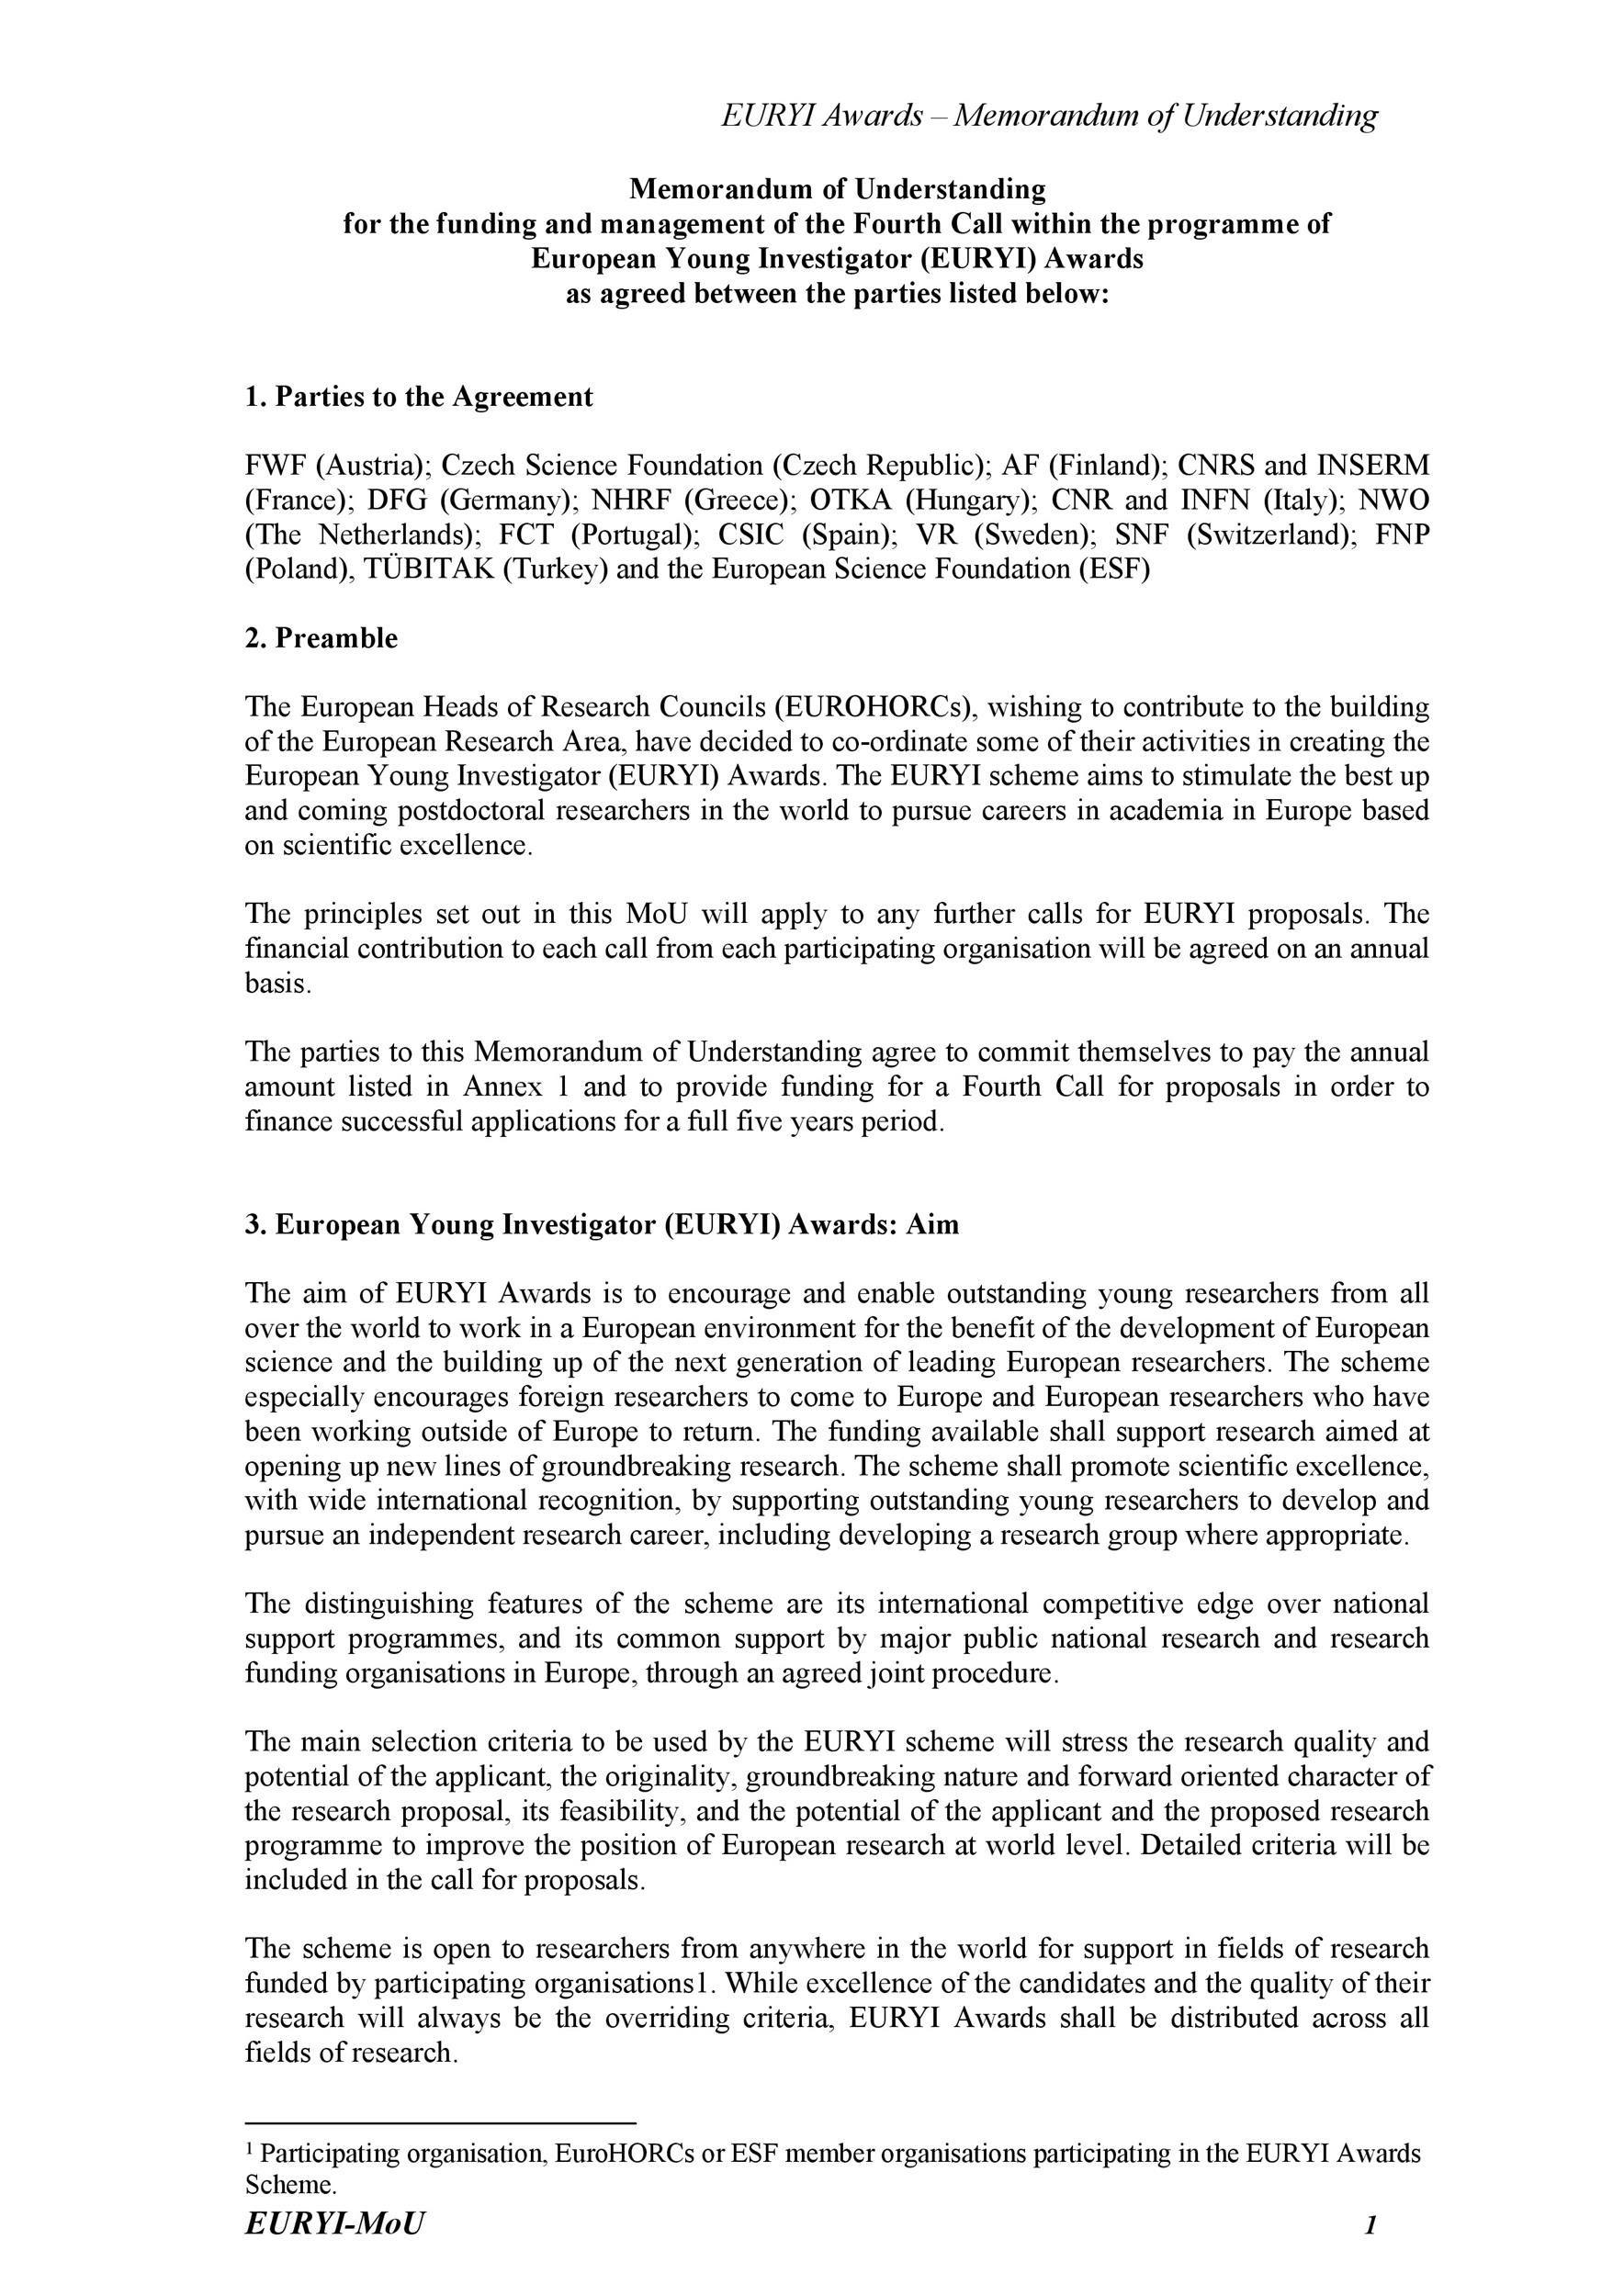 002 Unique Letter Of Understanding Format Design  Sample MemorandumFull